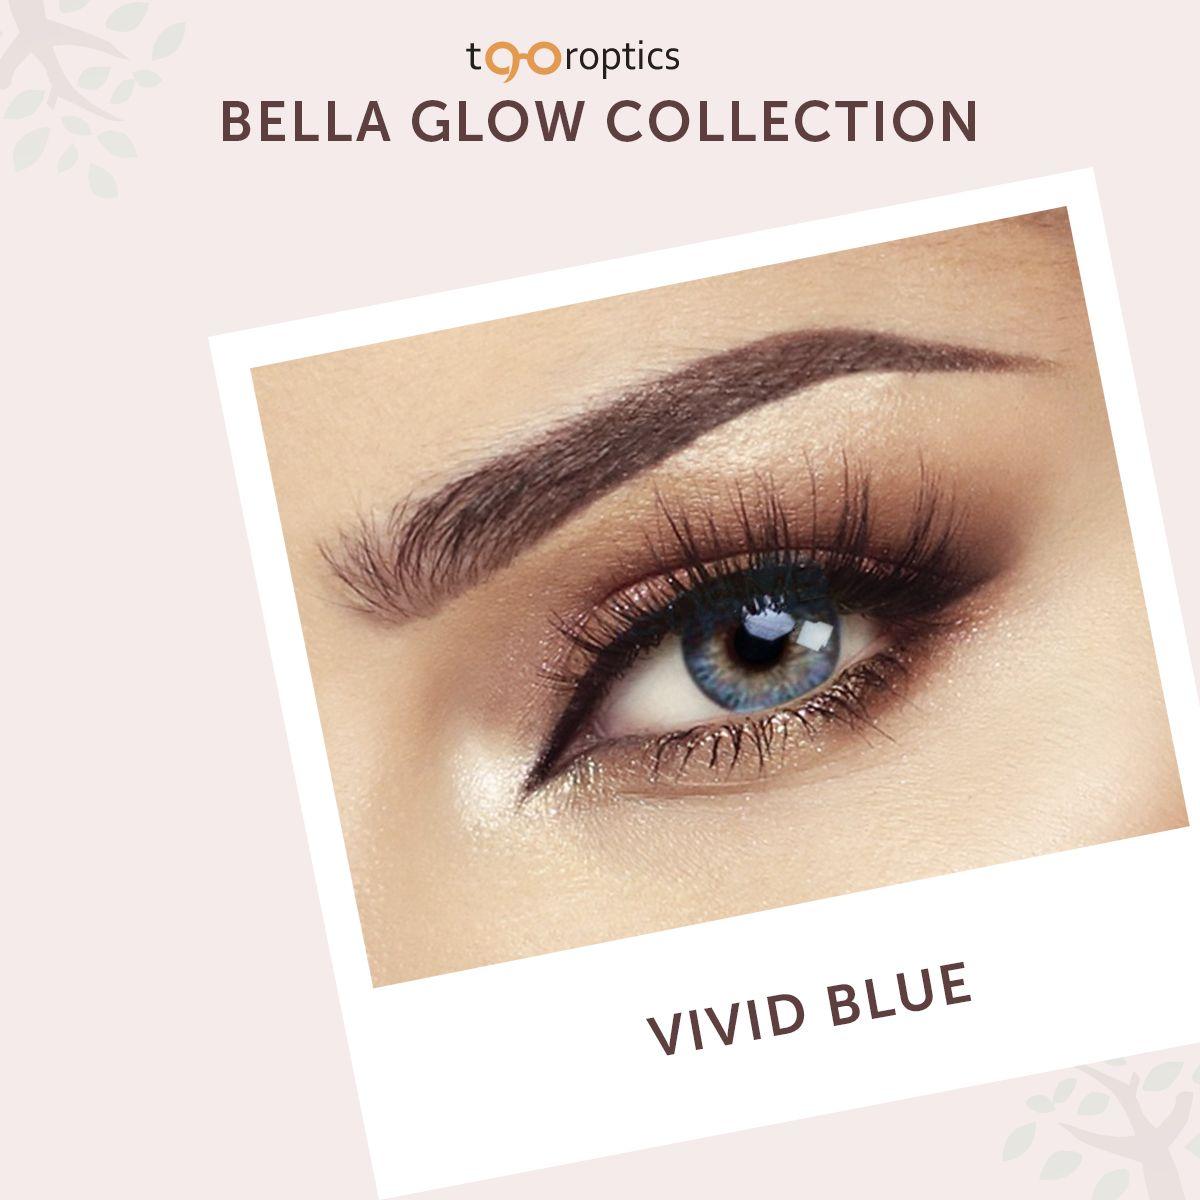 Bella Glow Collection Contact Lenses Contact Lenses Colored Lenses Contact Lenses